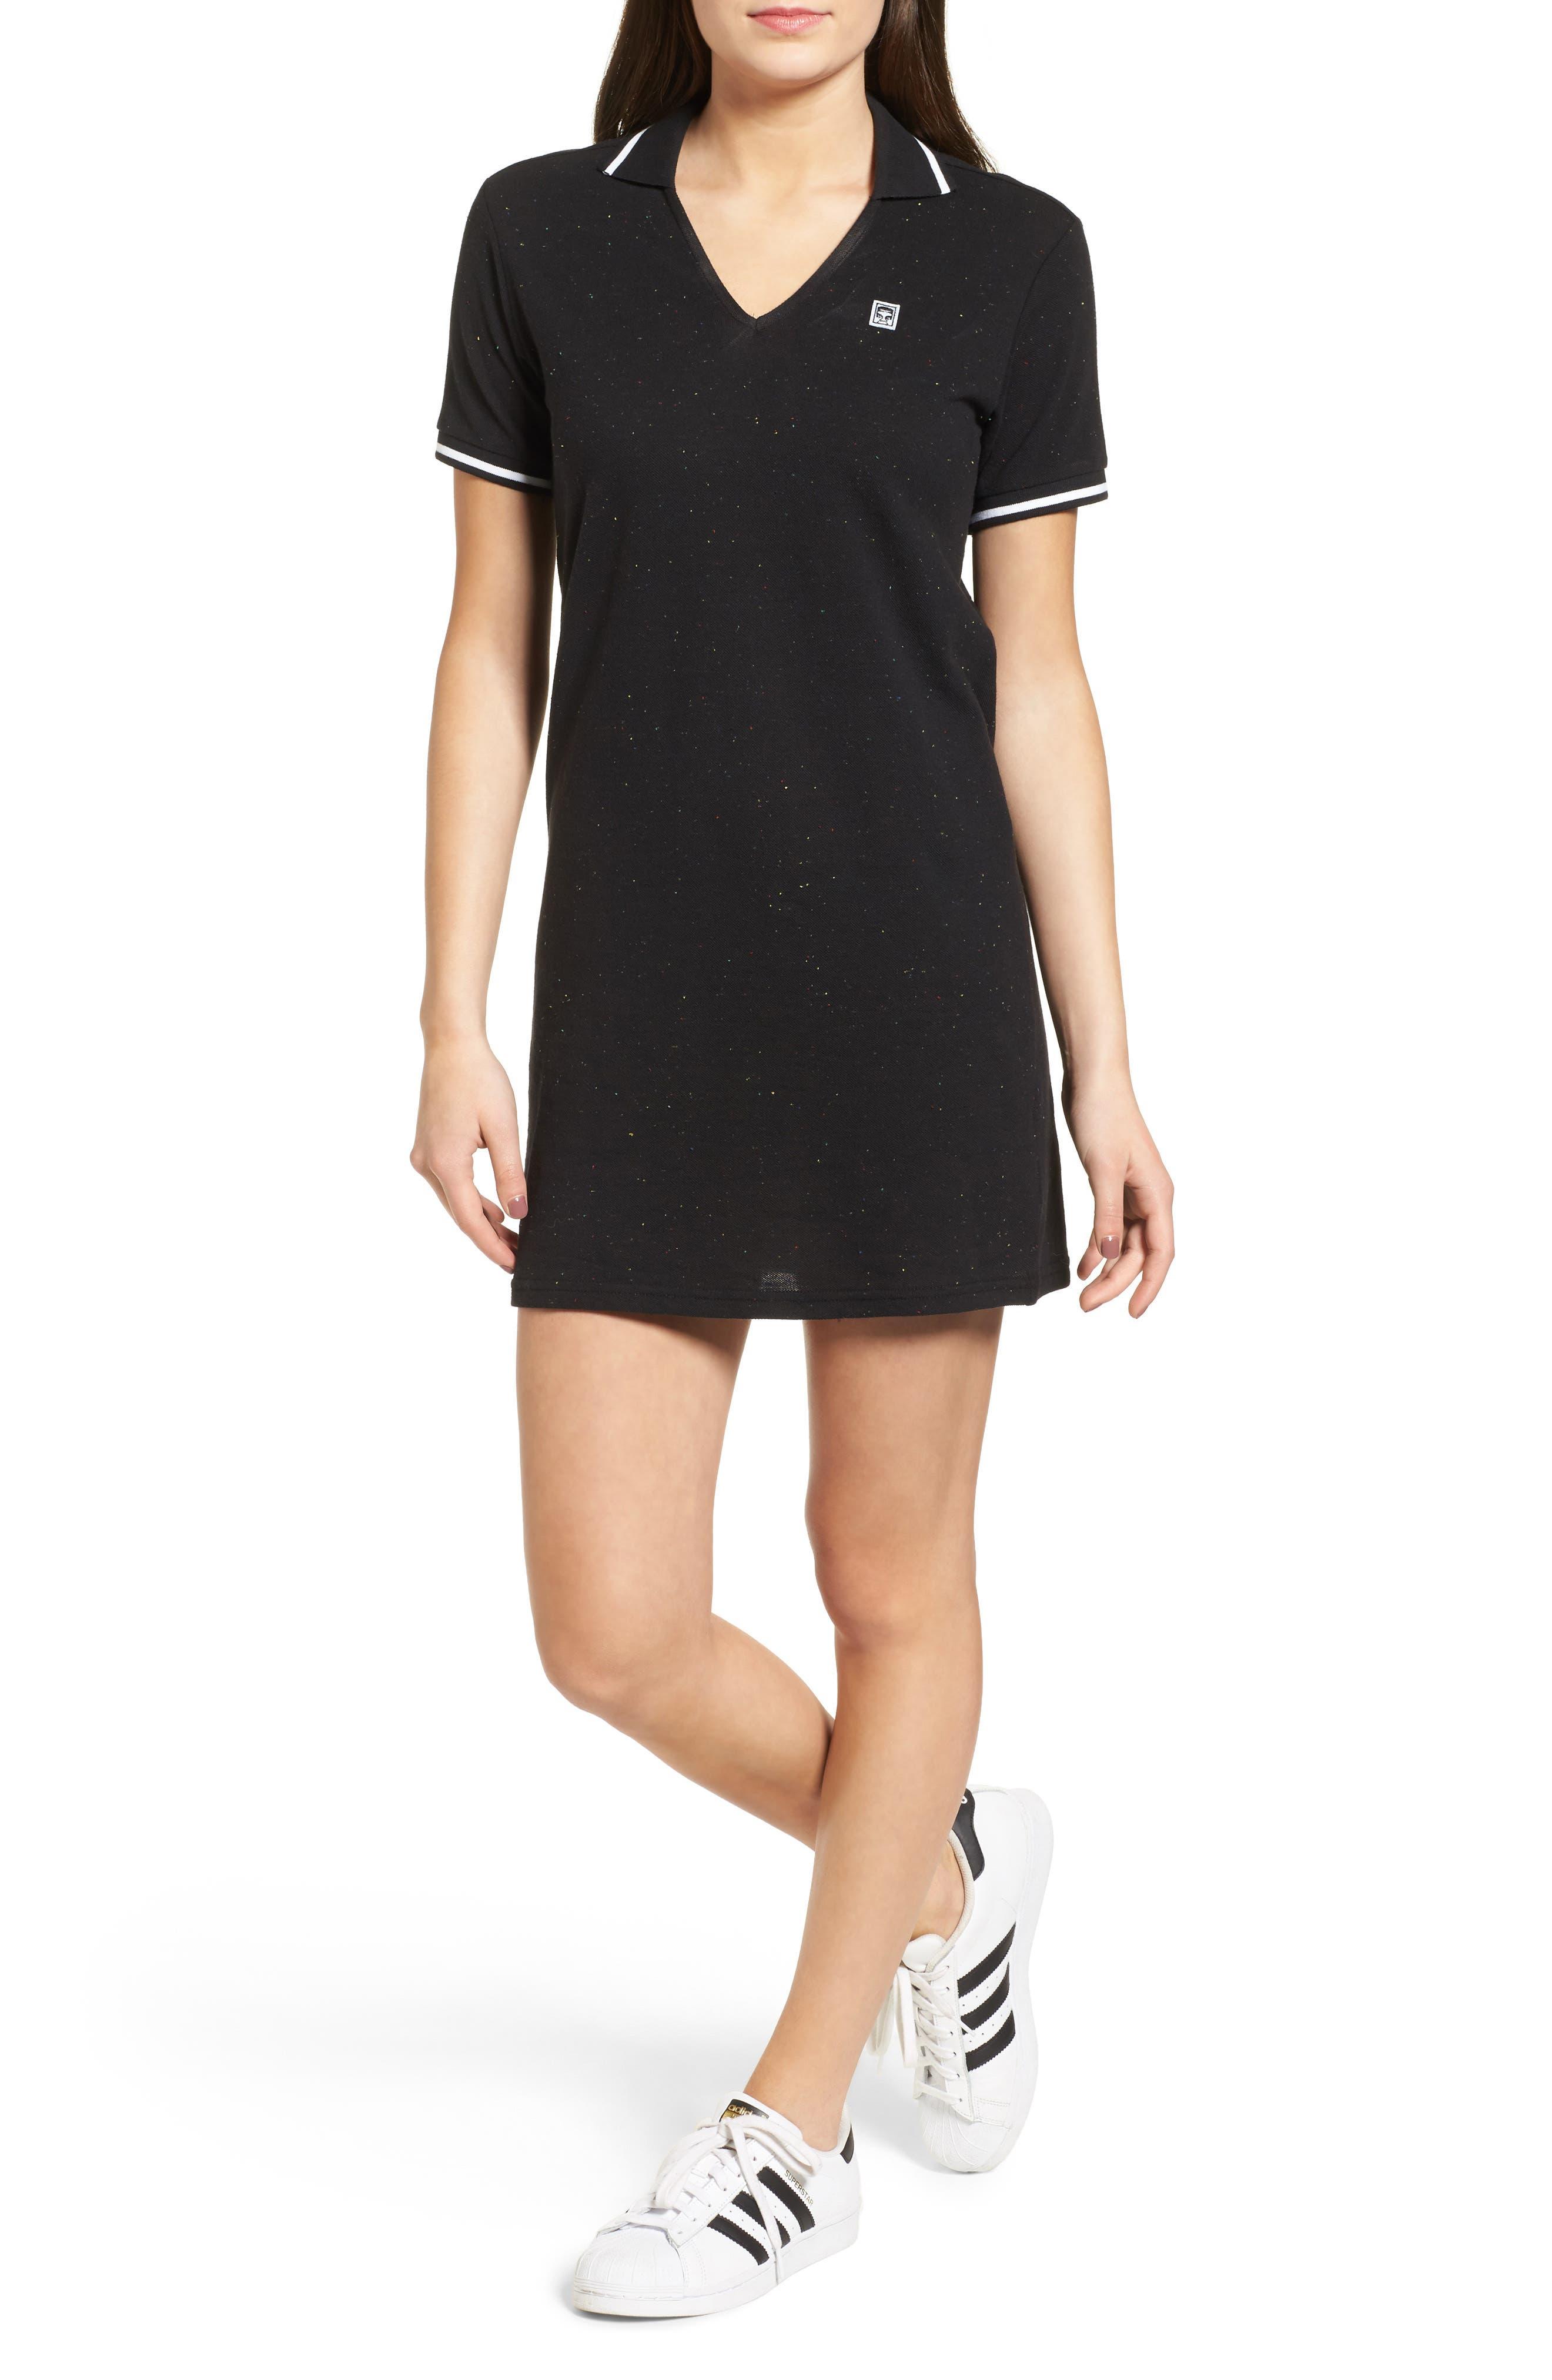 Main Image - Obey No. 89 Stretch Cotton Polo Dress